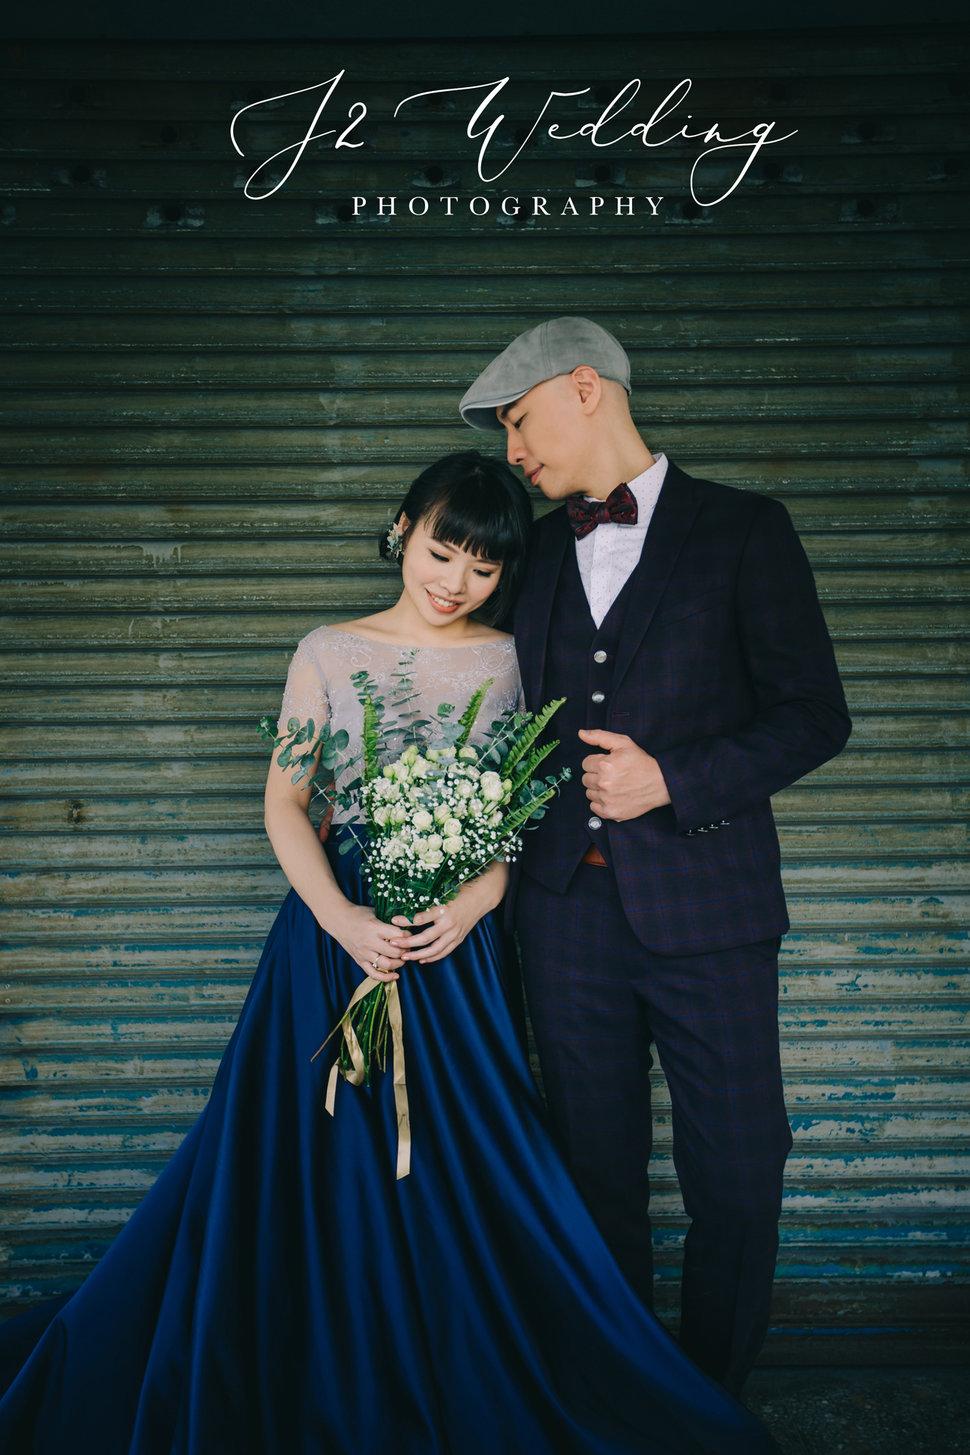 MAN_1864 - J2 wedding 板橋 中壢手工婚紗《結婚吧》